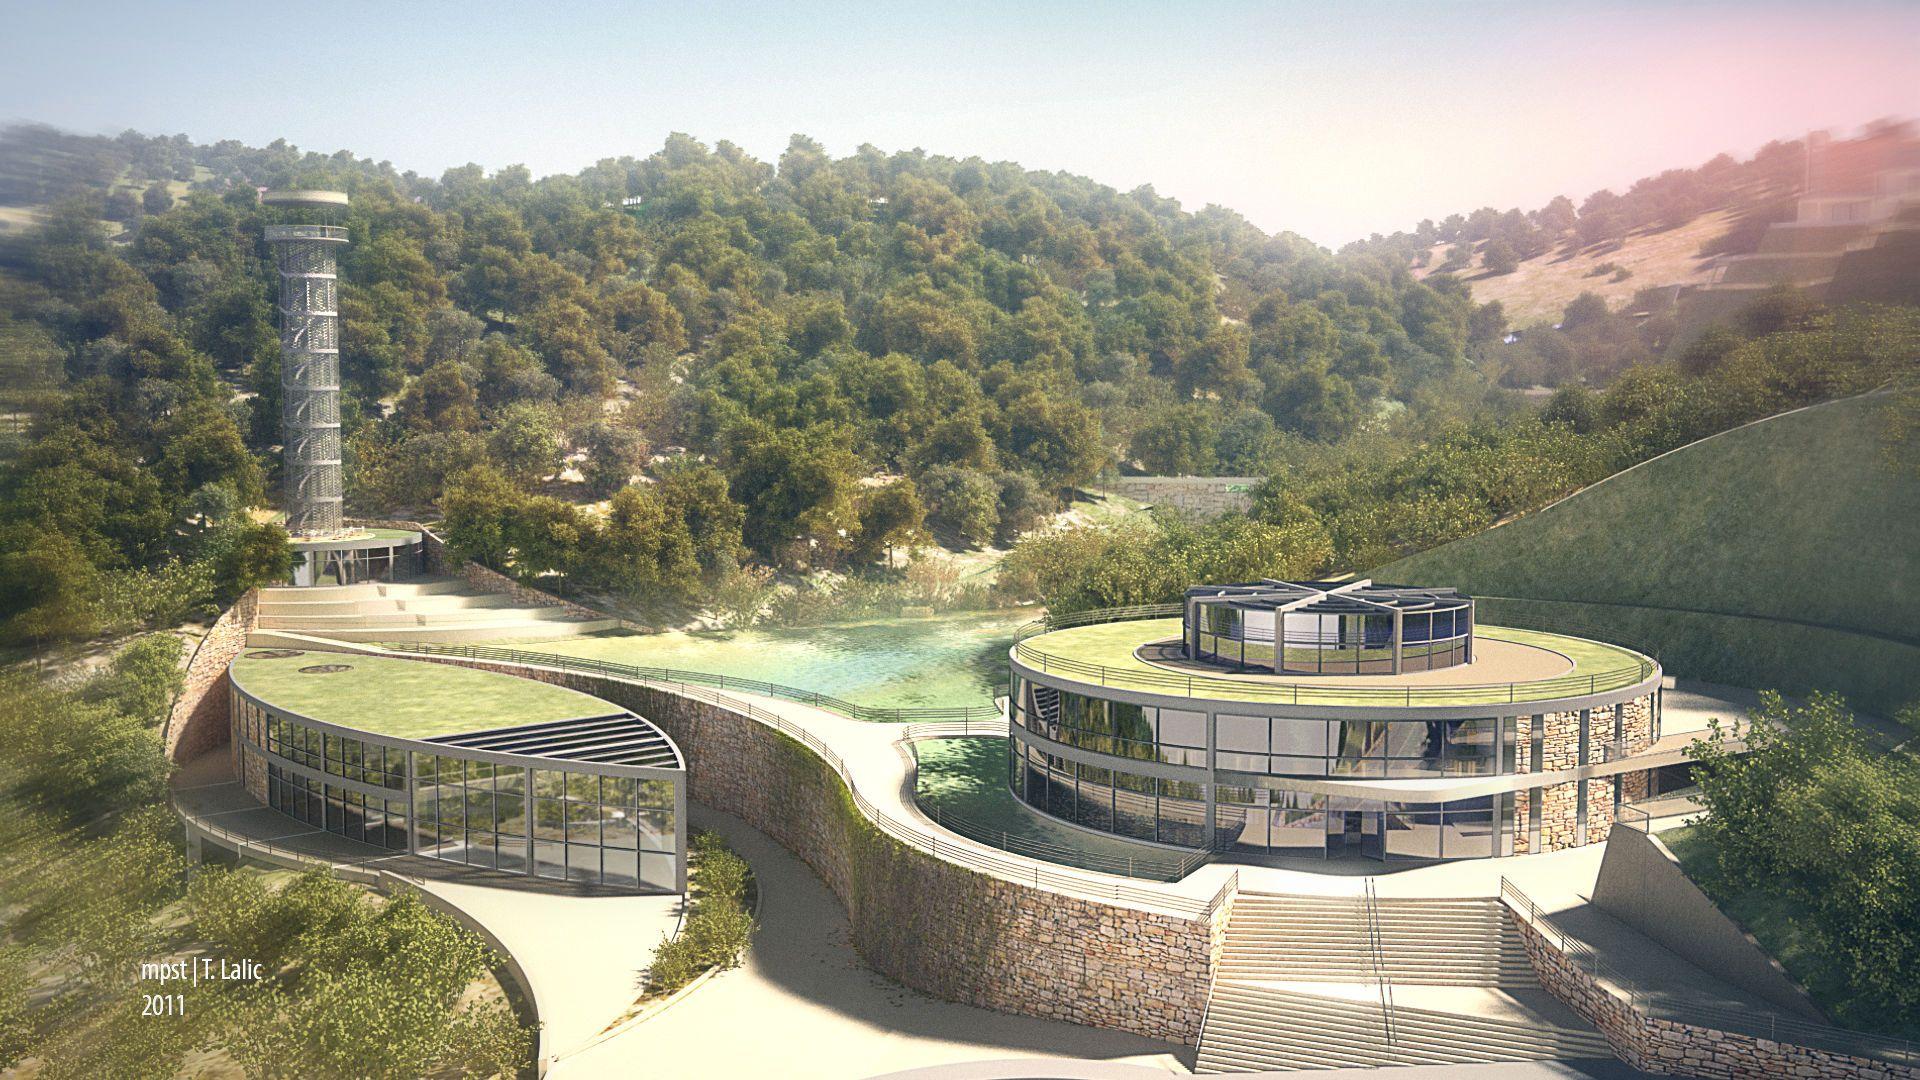 architectural terrain rendering in Google